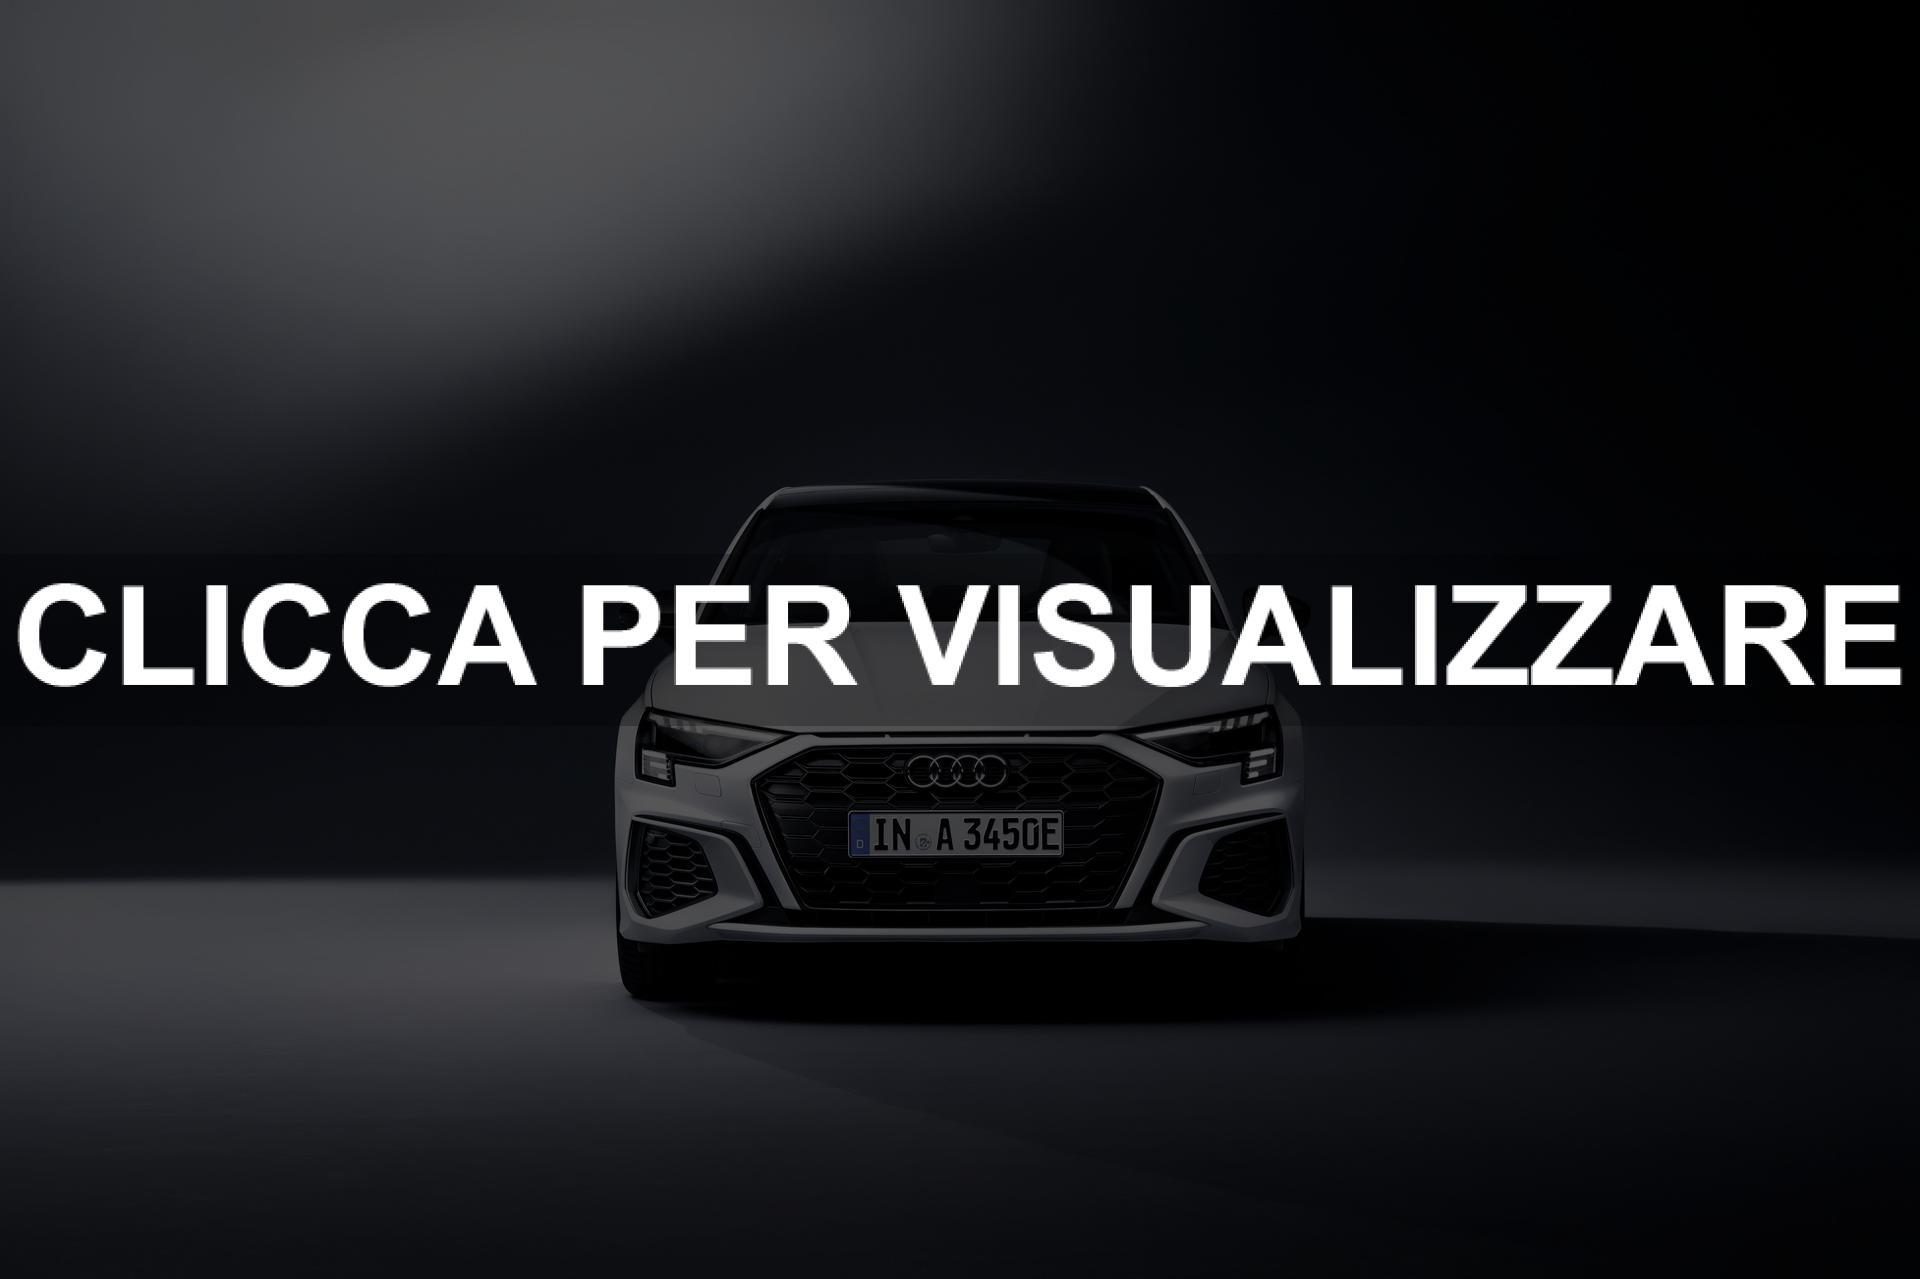 Immagine frontale nuova Audi A3 Sportback 45 TFSI Ibrida plug in 2021